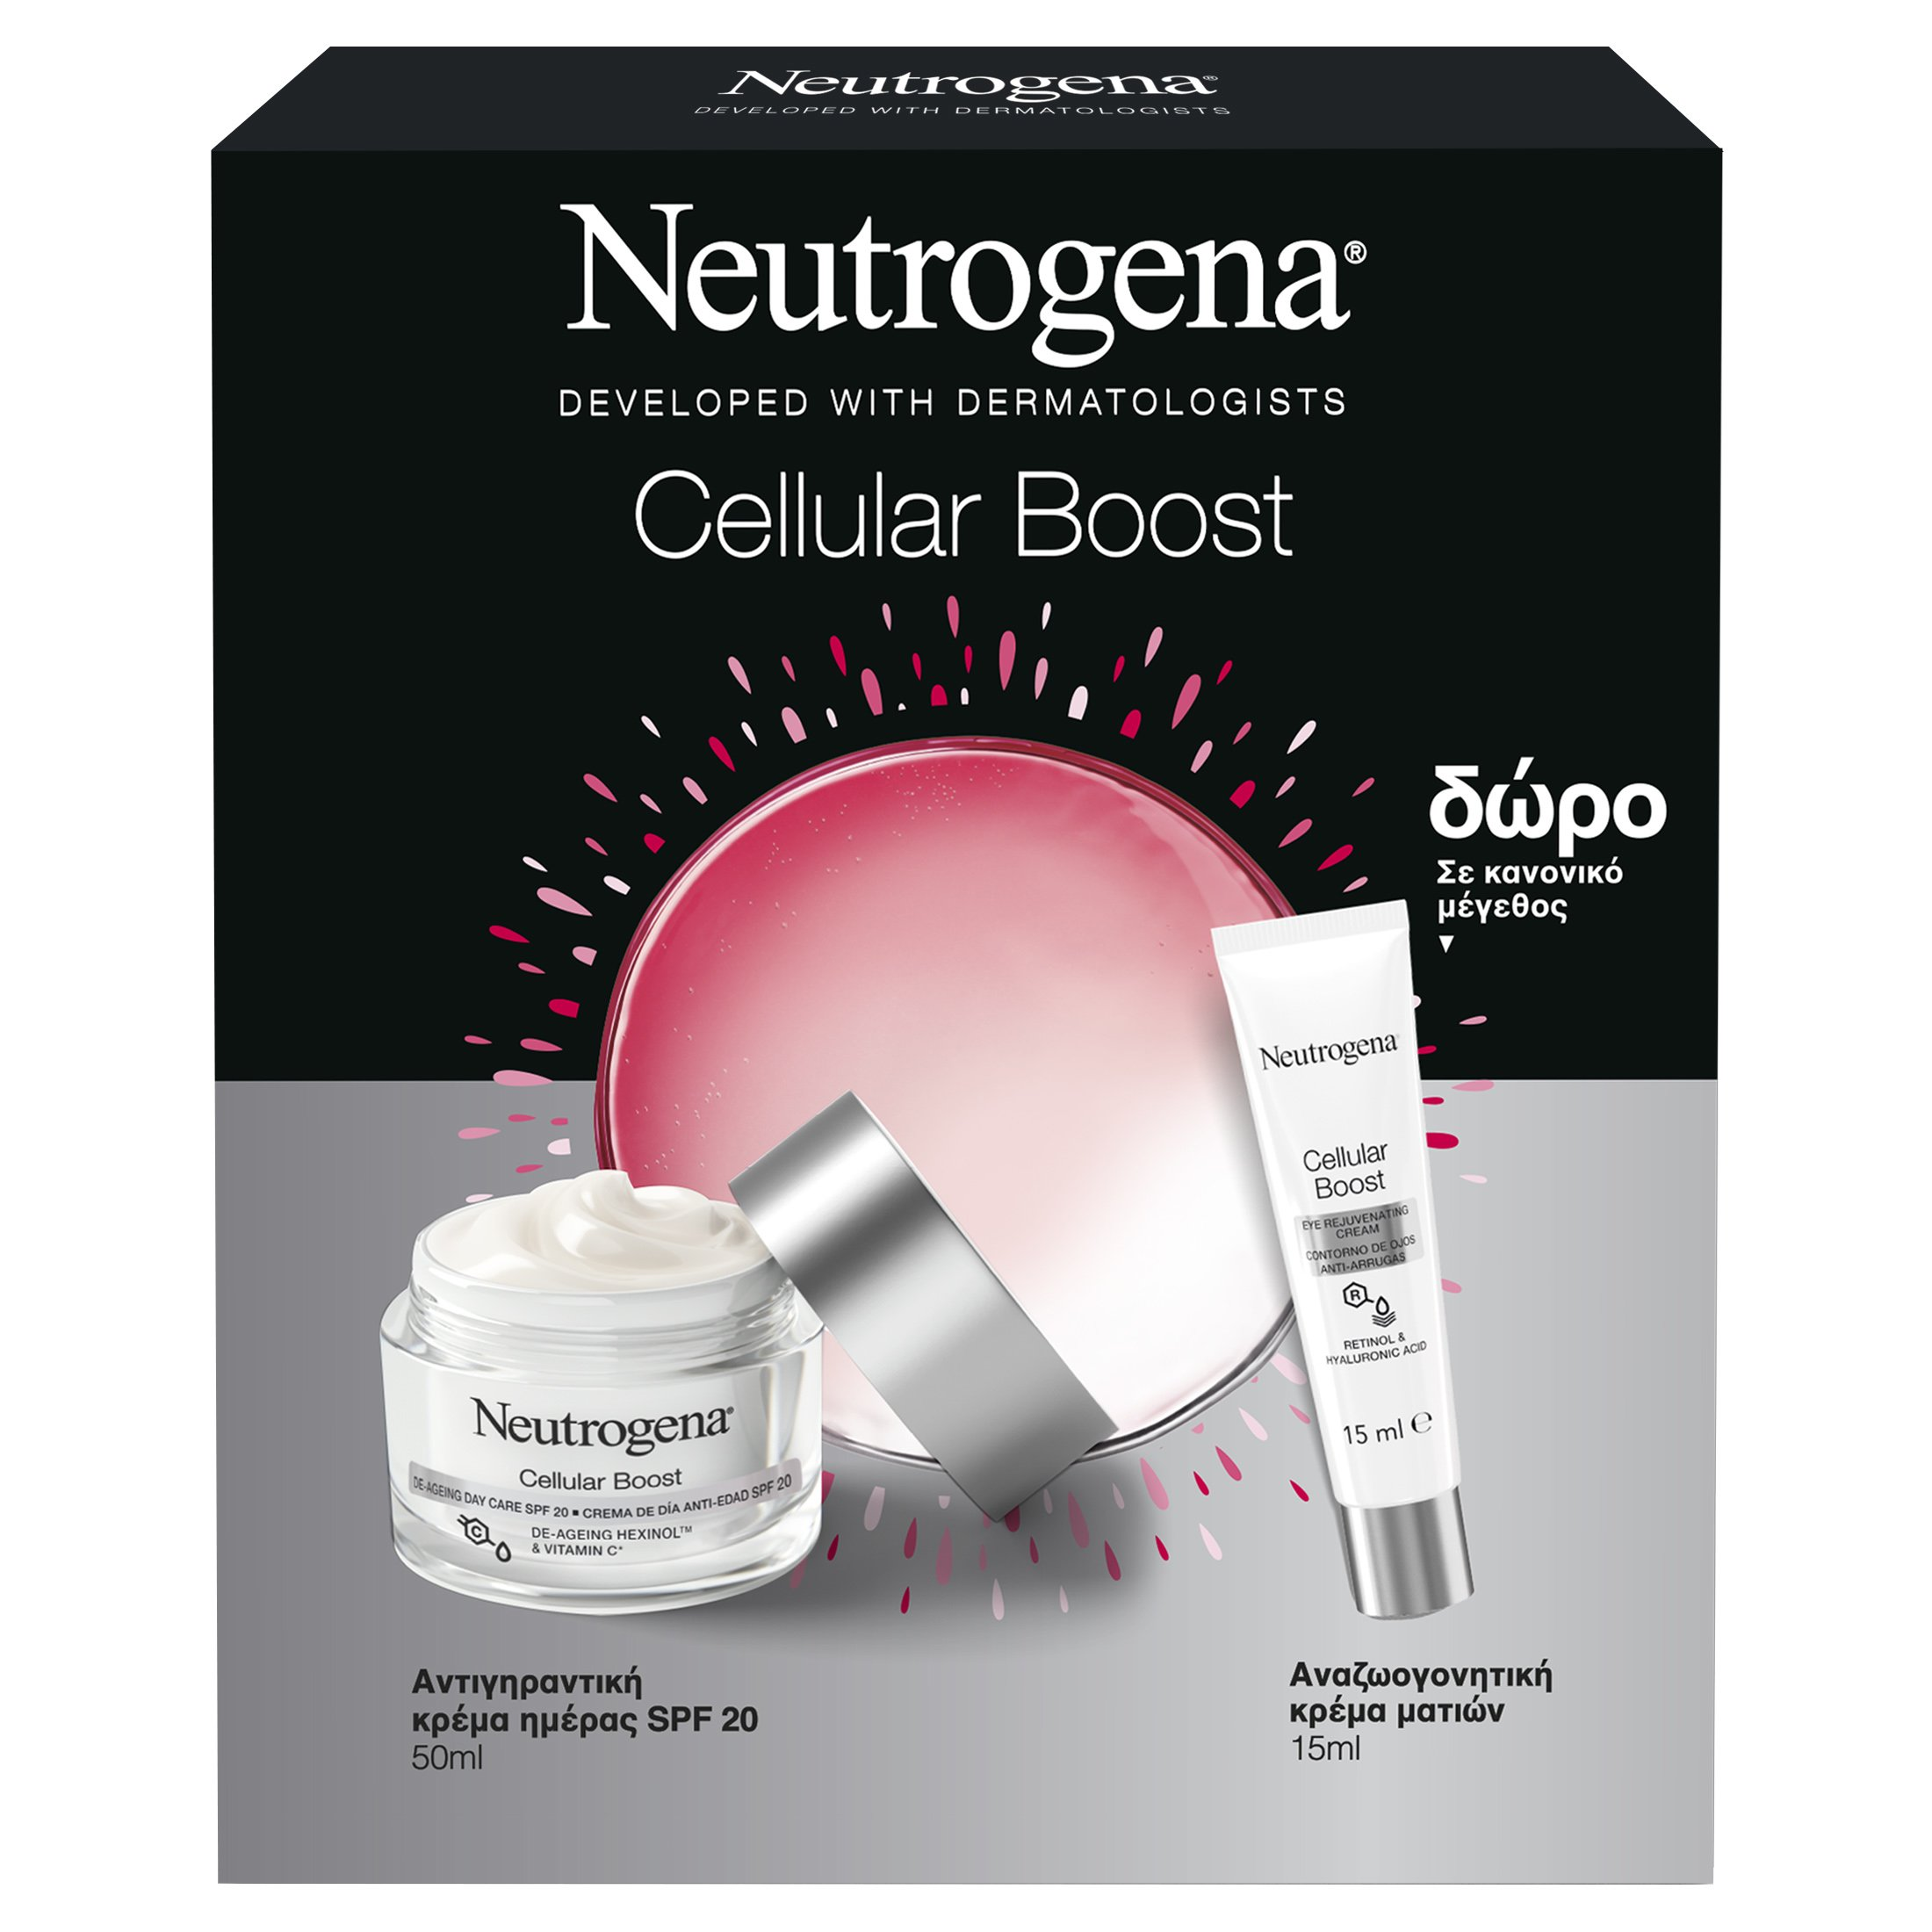 Neutrogena Πακέτο Προσφοράς Cellular Boost Αντιγηραντική Κρέμα Ημέρας Spf20, 50ml & Δώρο Αναζωογονητική Κρέμα Ματιών 15ml